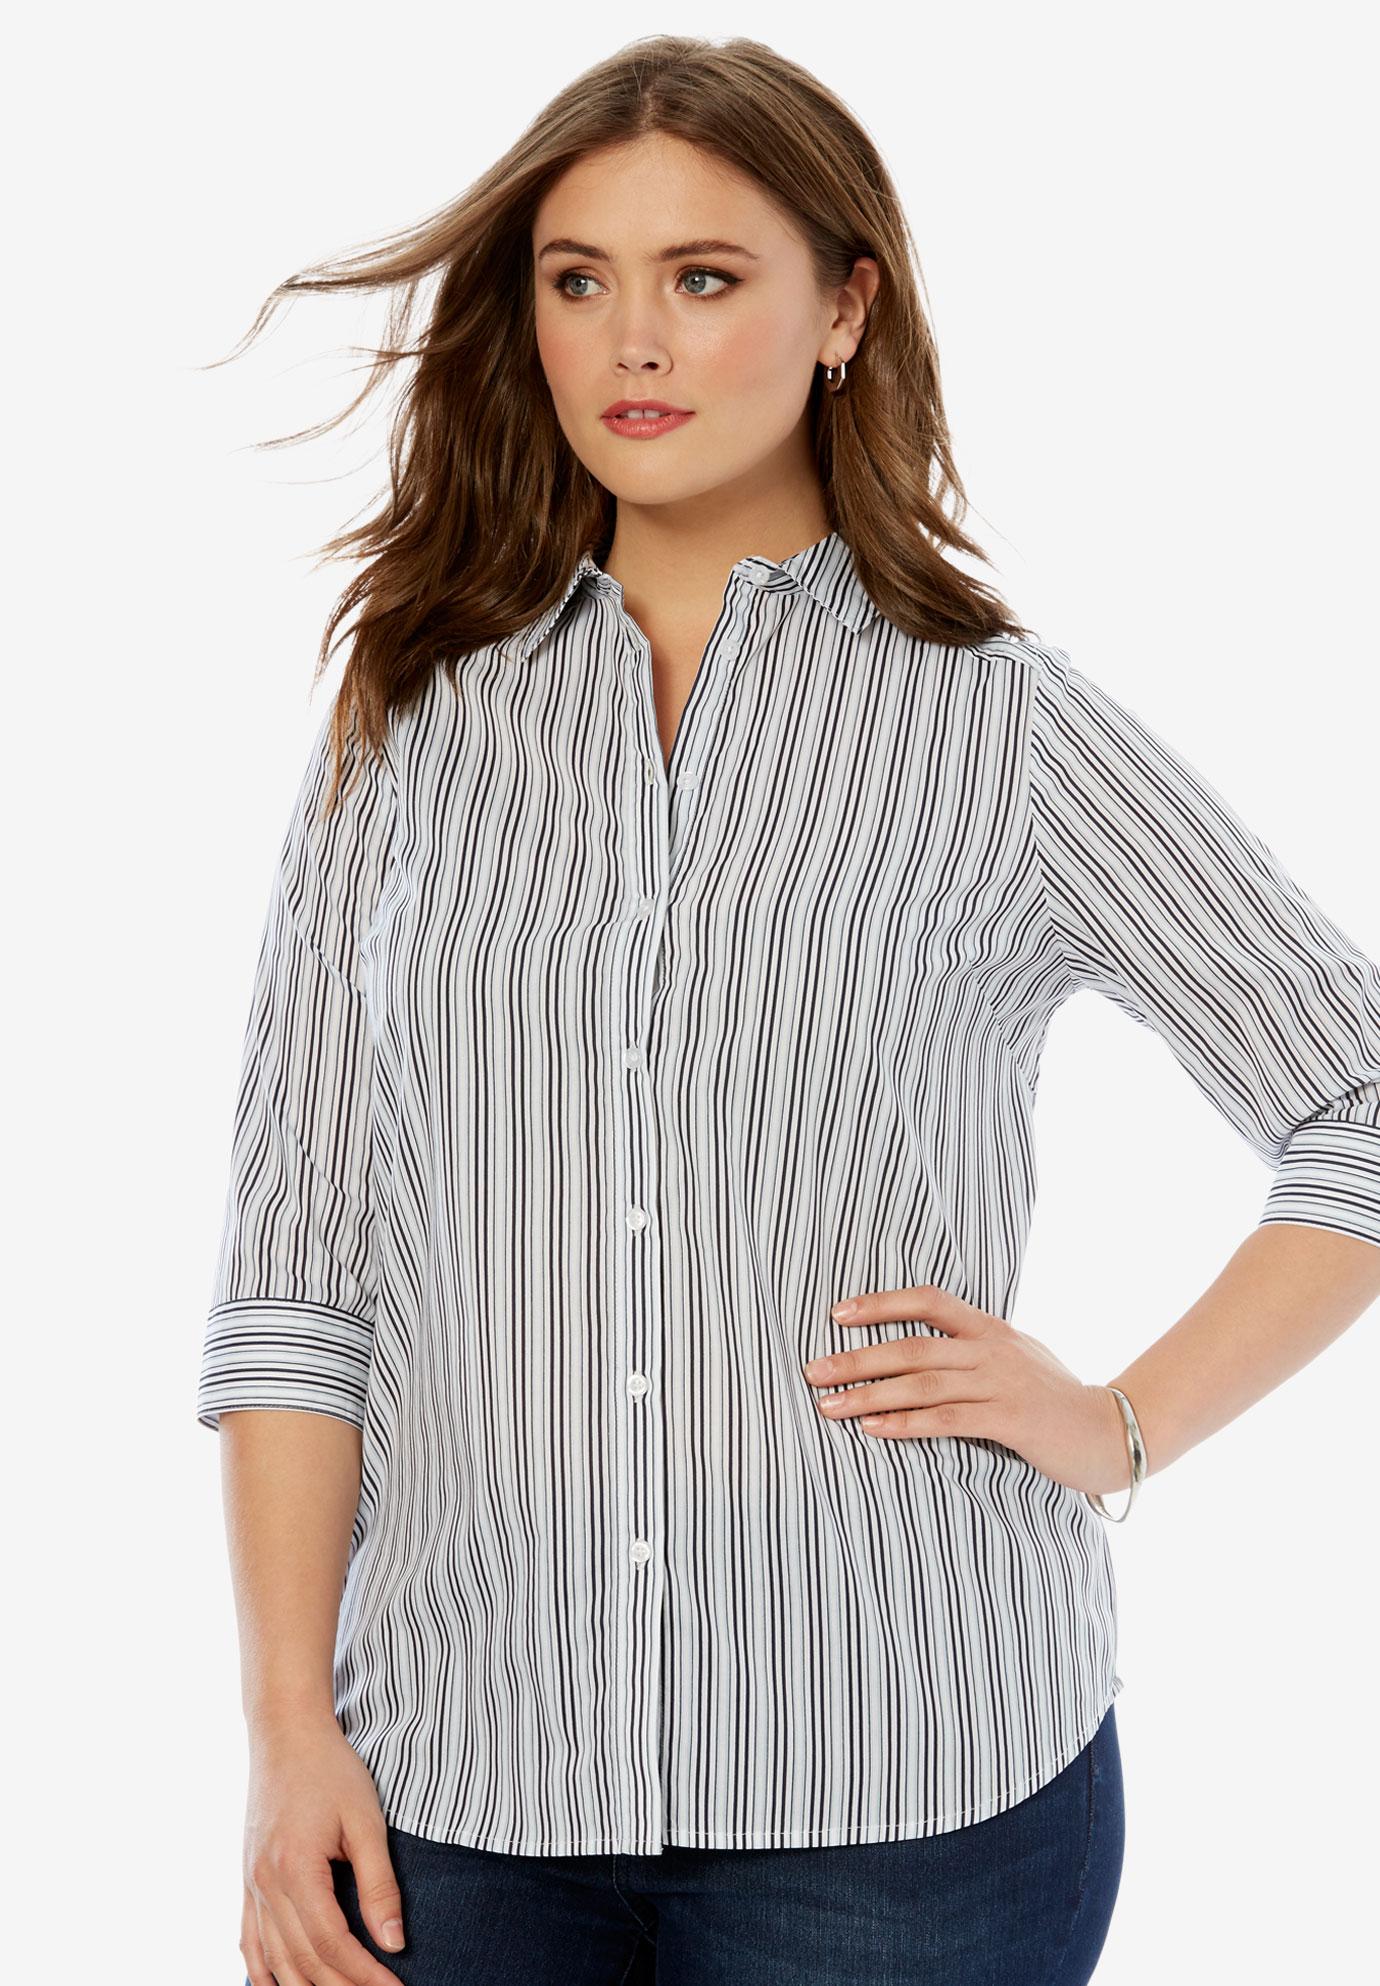 8184aad5b Three-Quarter Sleeve Kate Shirt| Plus Size Shirts & Blouses | Full ...